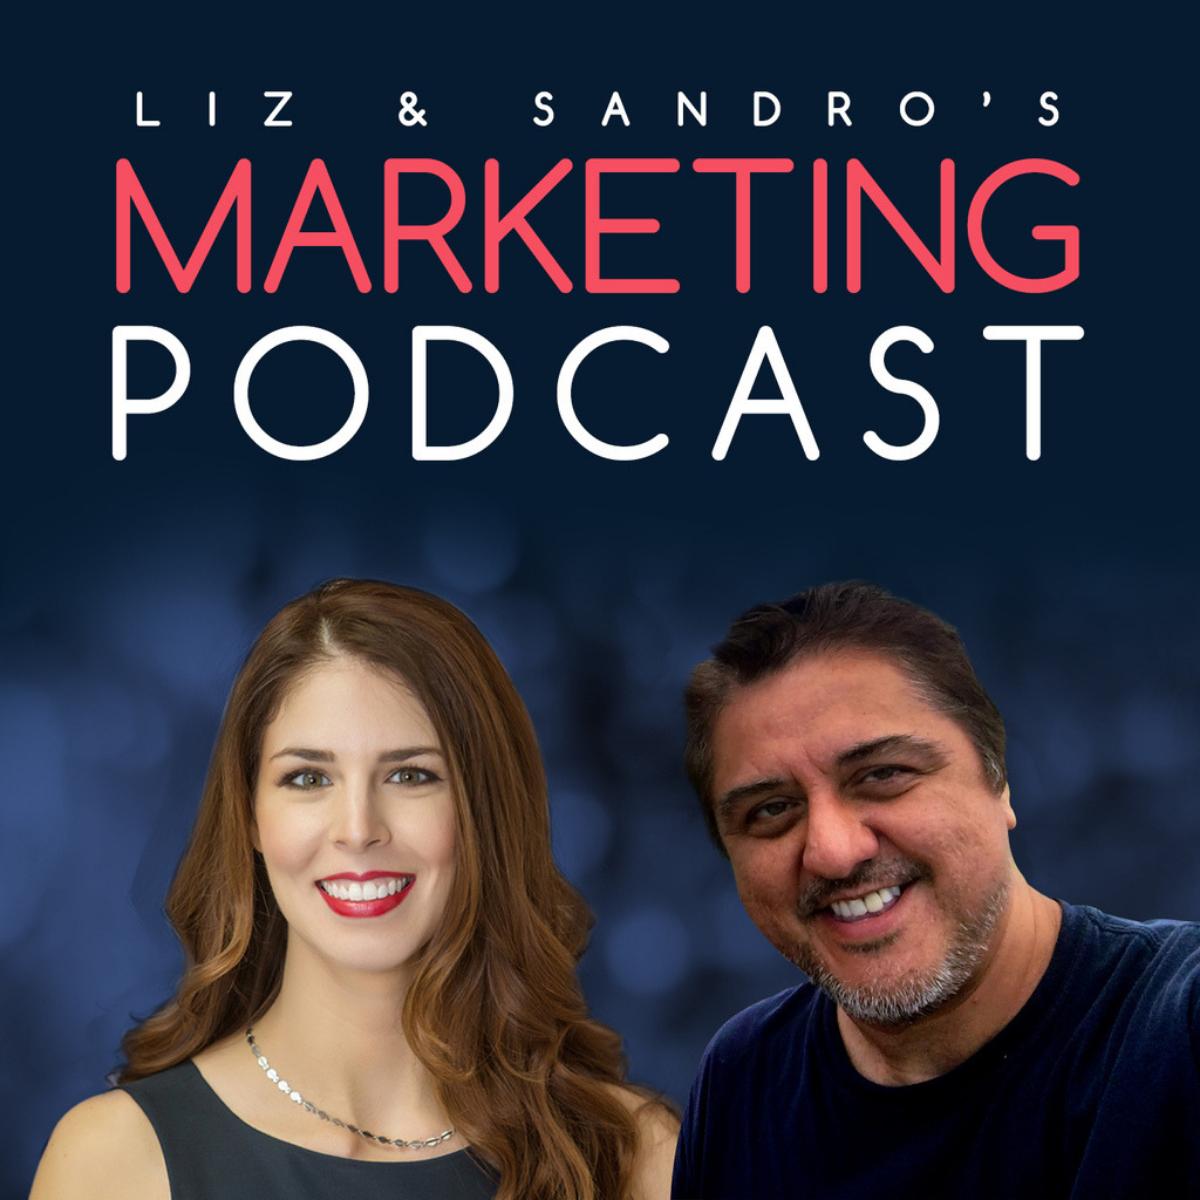 Liz & Sandro's Marketing Podcast show art